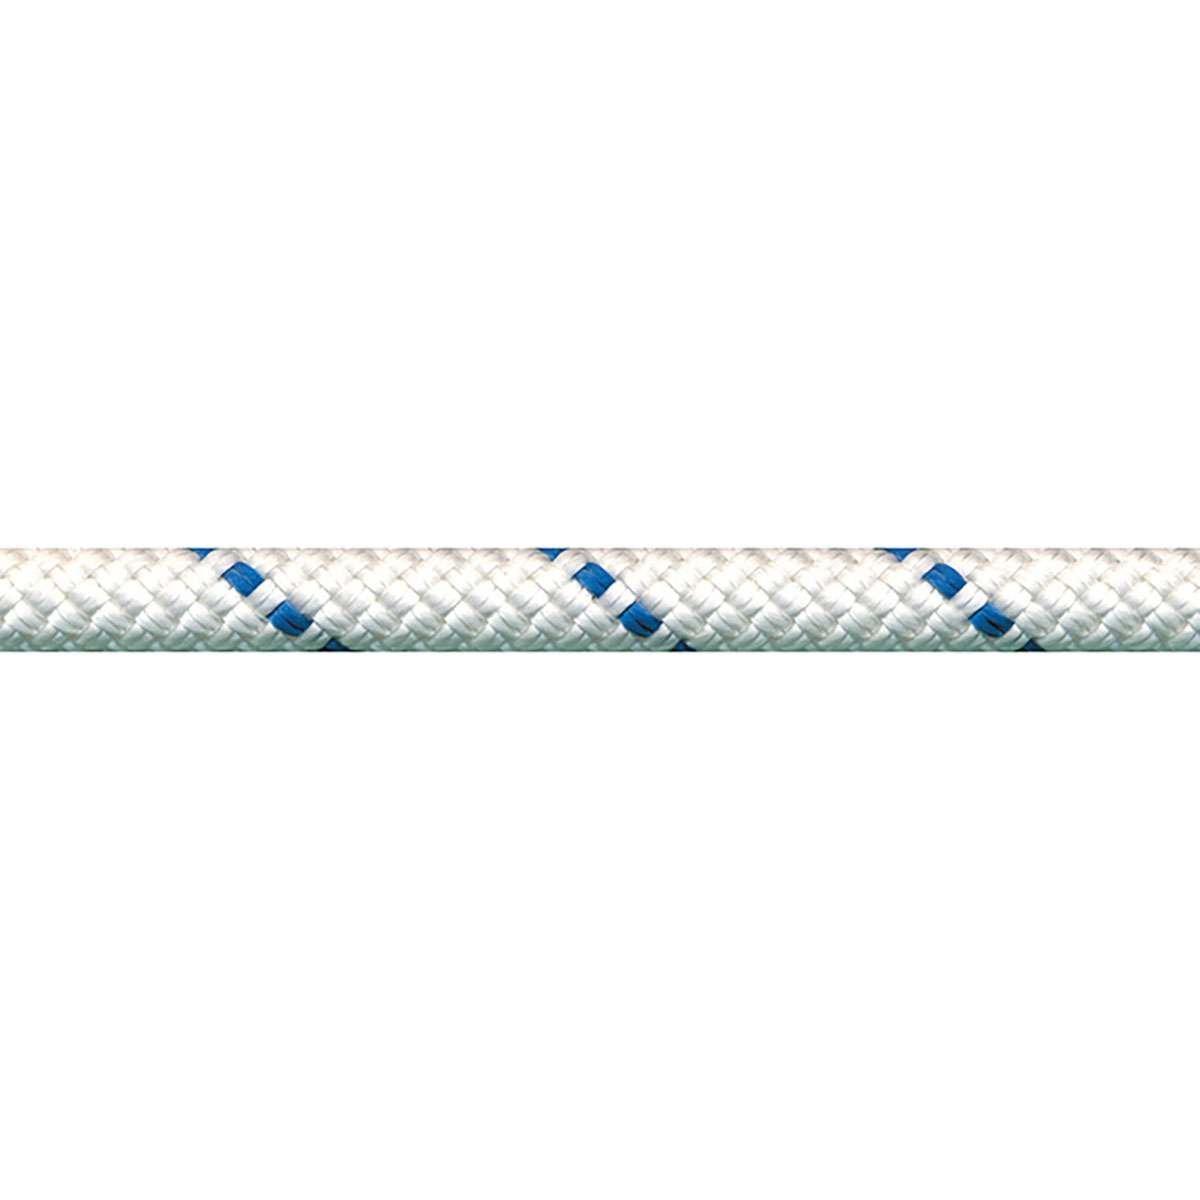 Beal spelenium低ストレッチロープ – 10 mm 200 m – bcsp10.200 B01MF4OJT6